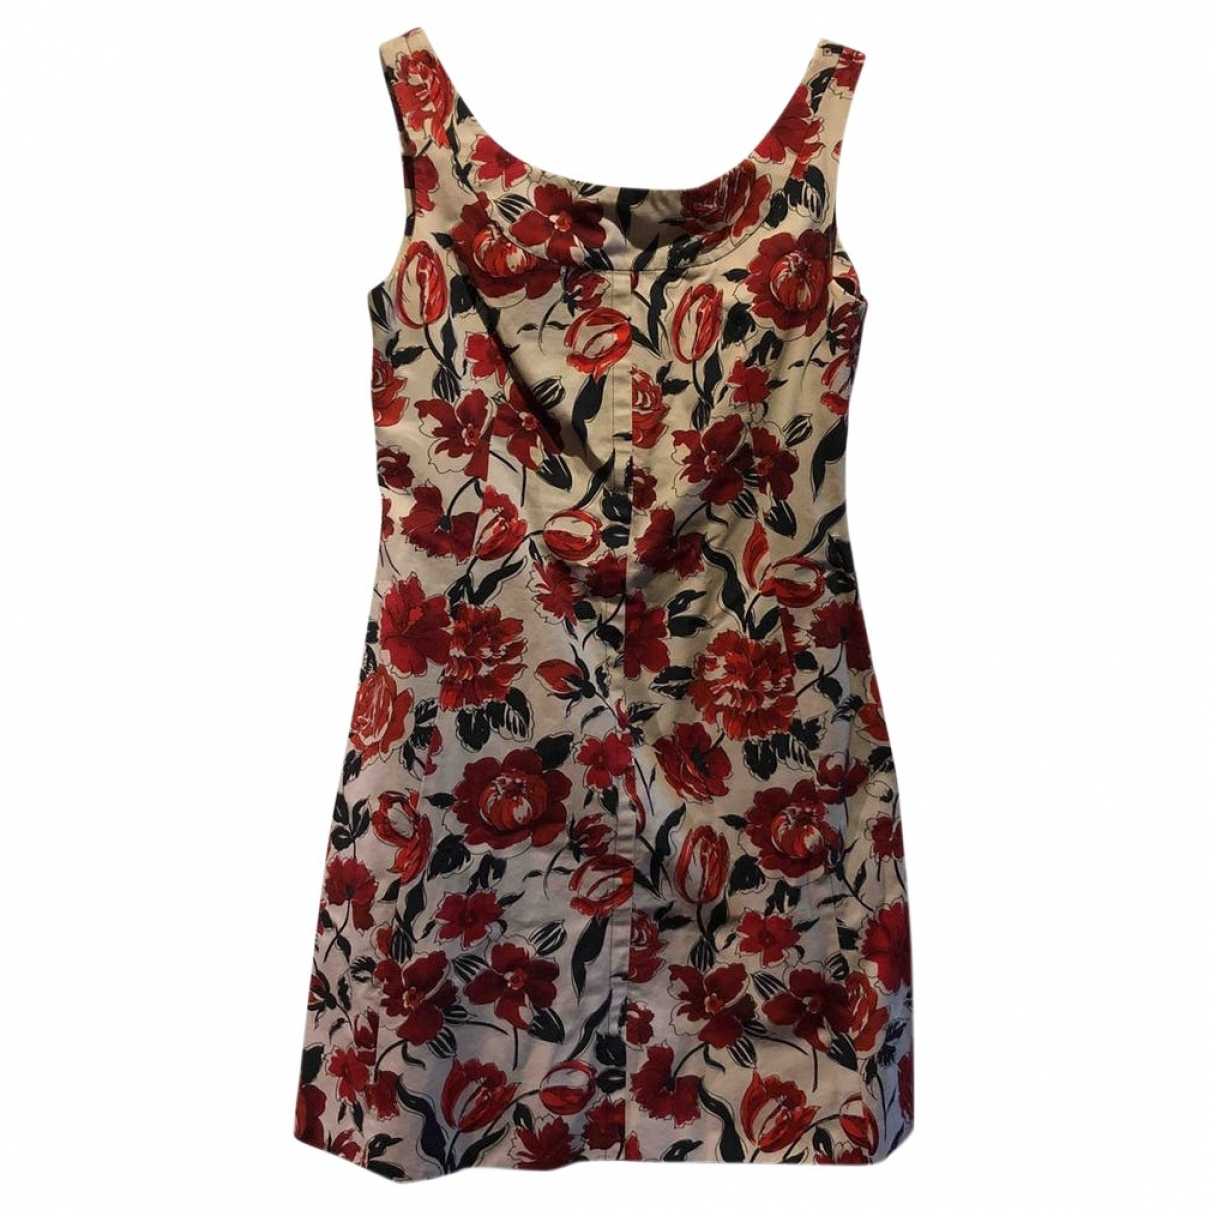 Jil Sander \N Multicolour Cotton dress for Women 38 FR